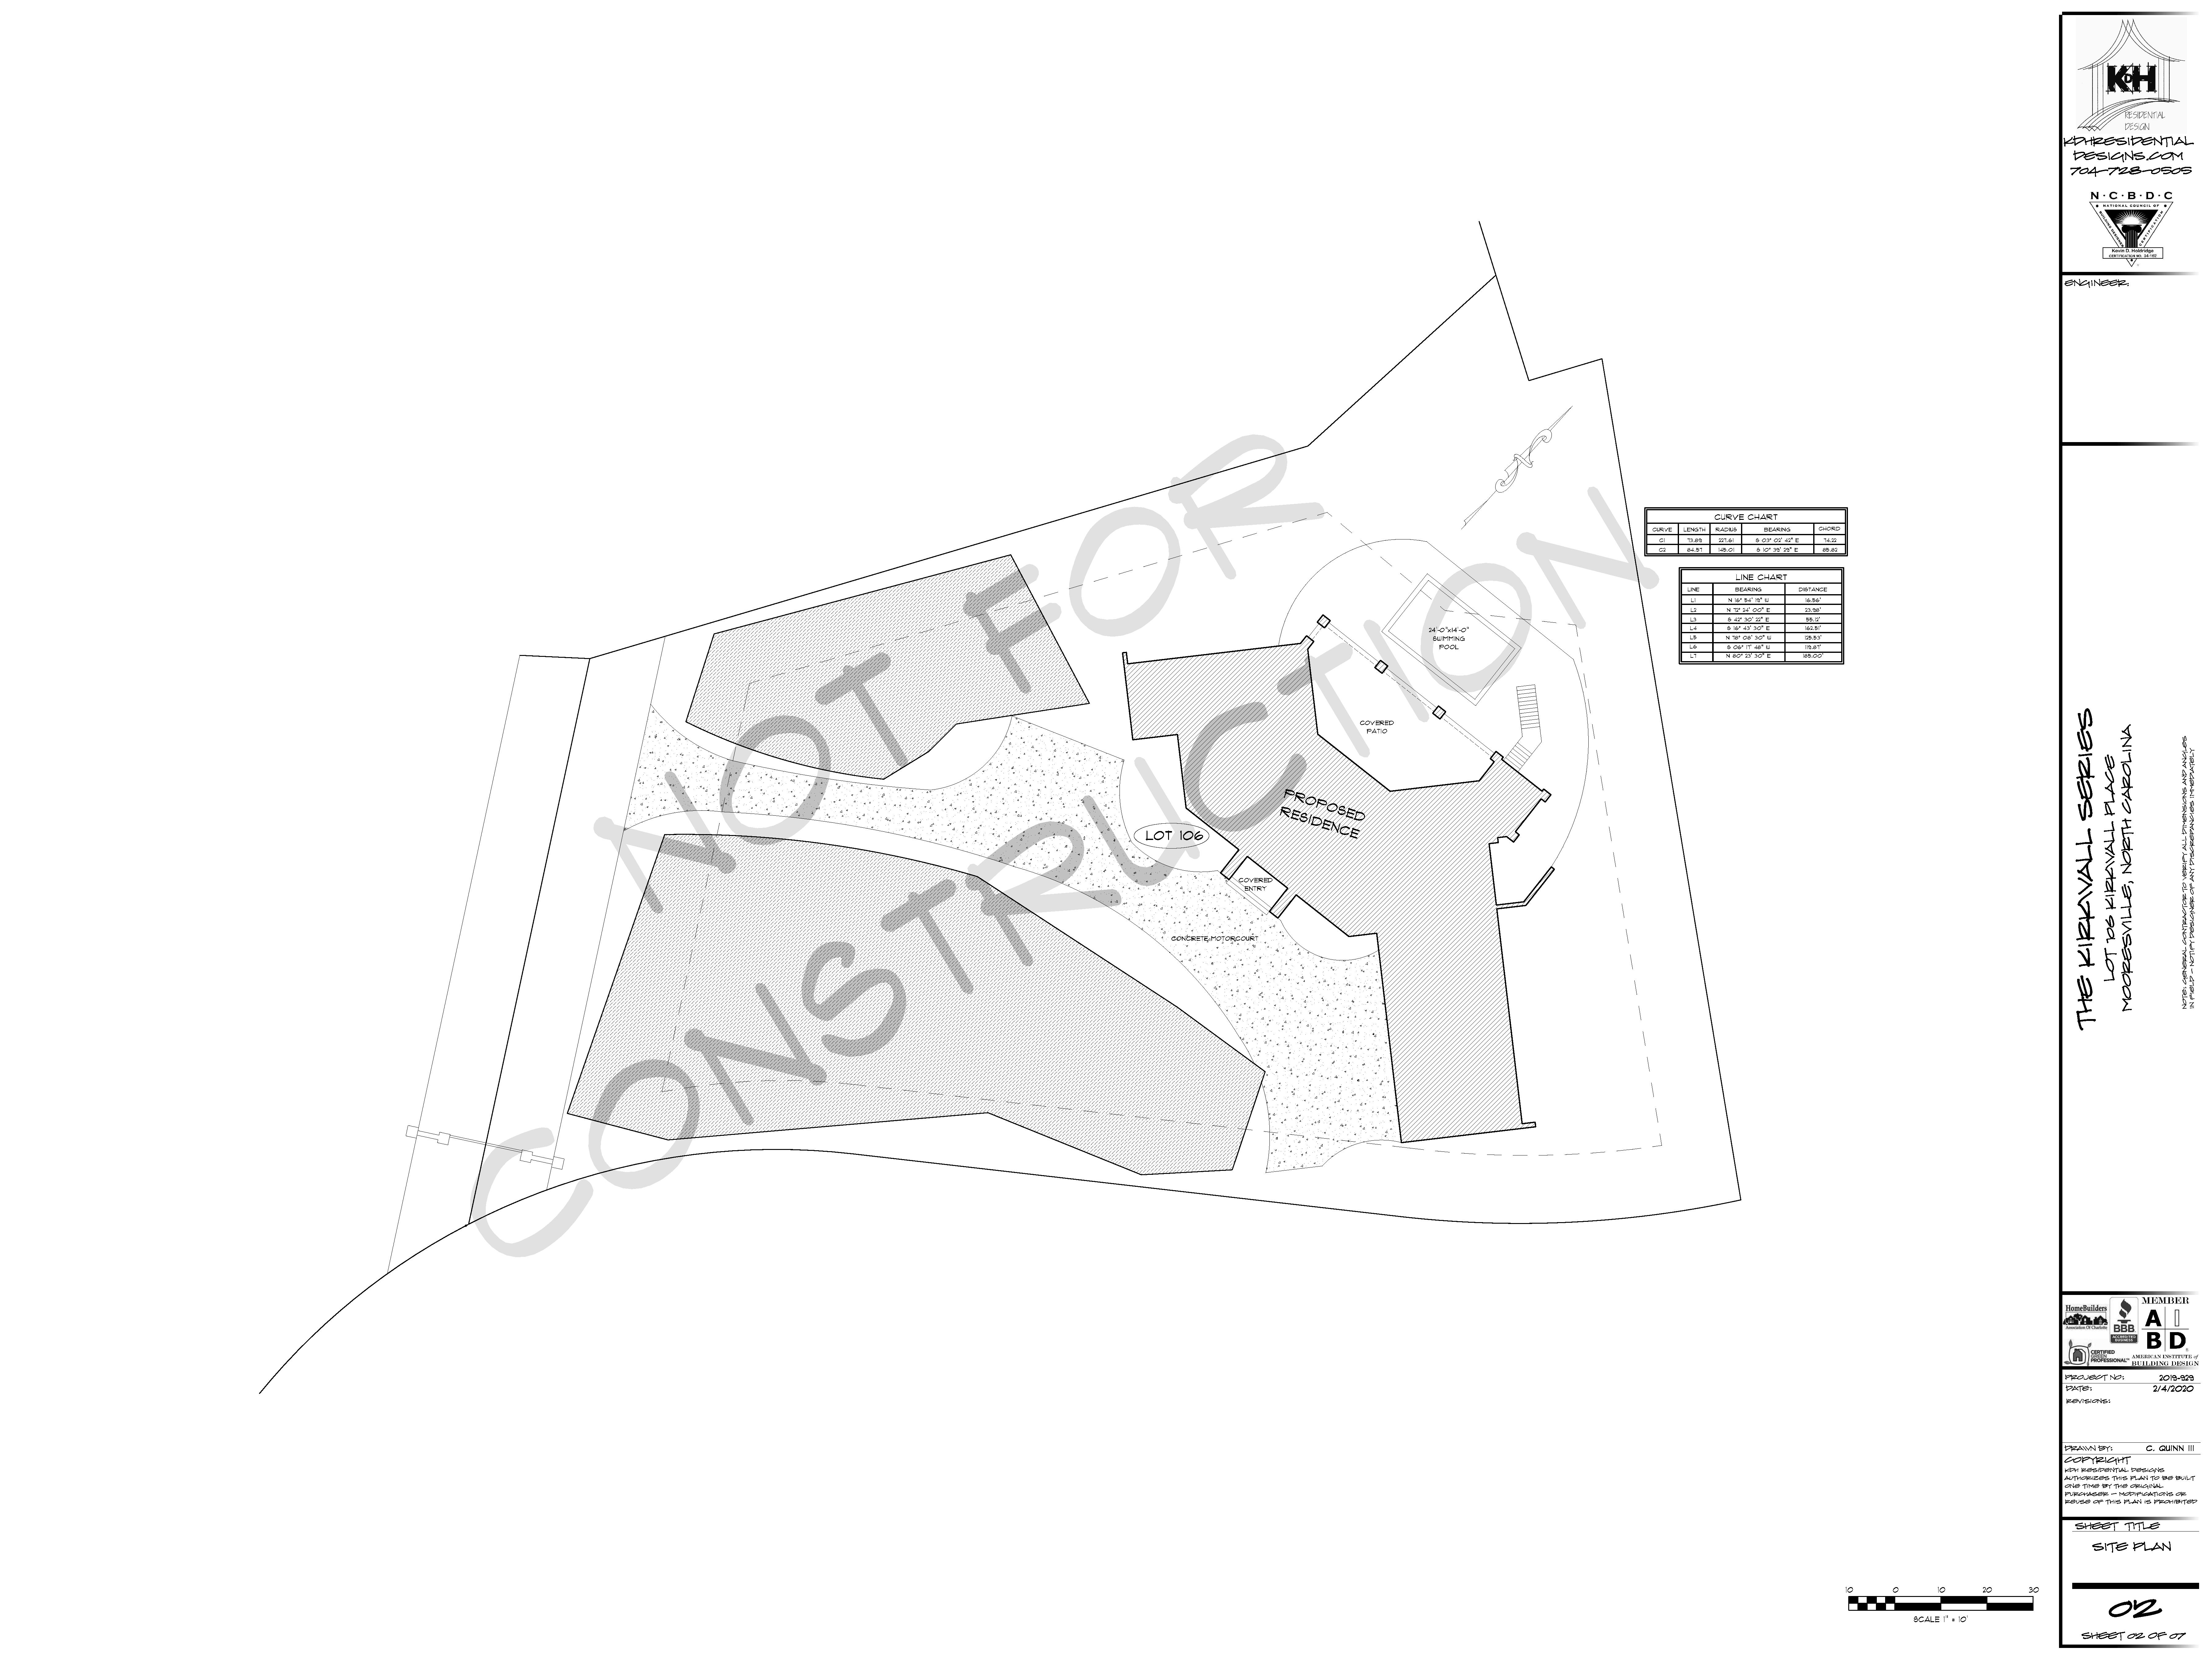 106 Kirkwall Place Site Plan